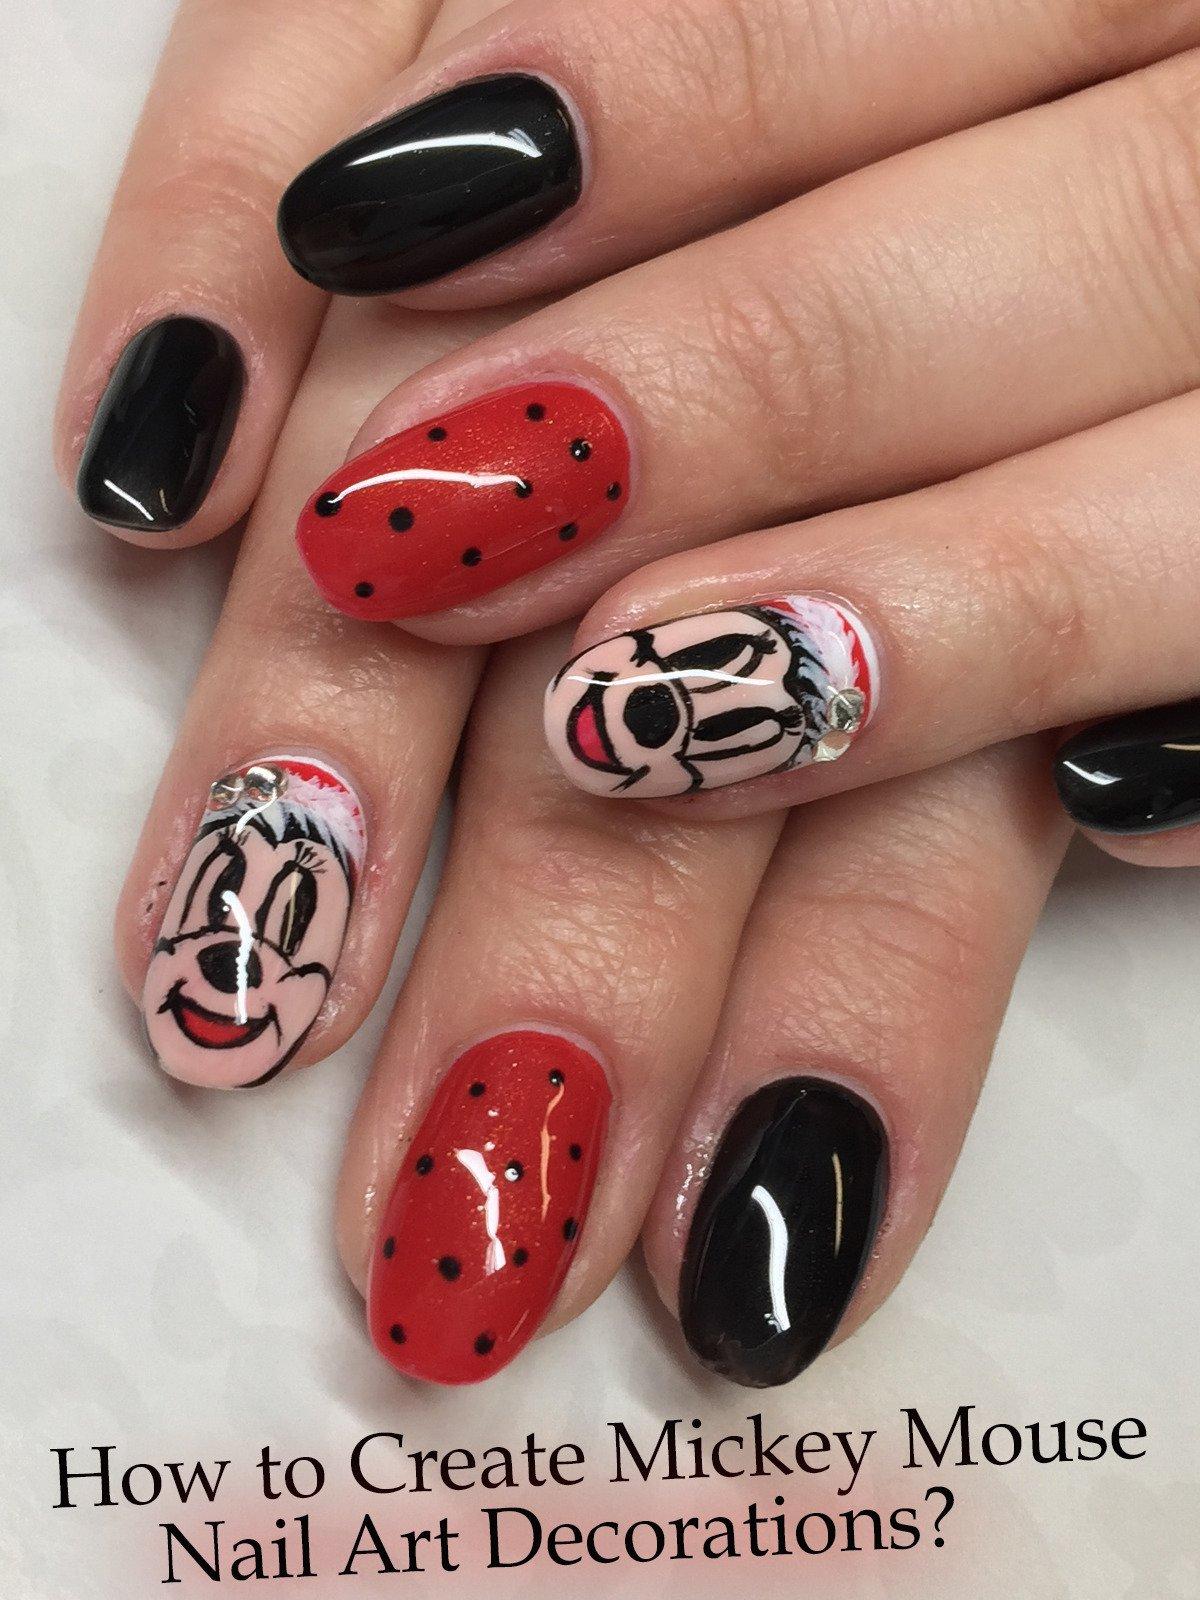 Amazon.com: How to Create Mickey Mouse Nail Art Decorations?: Tanya ...